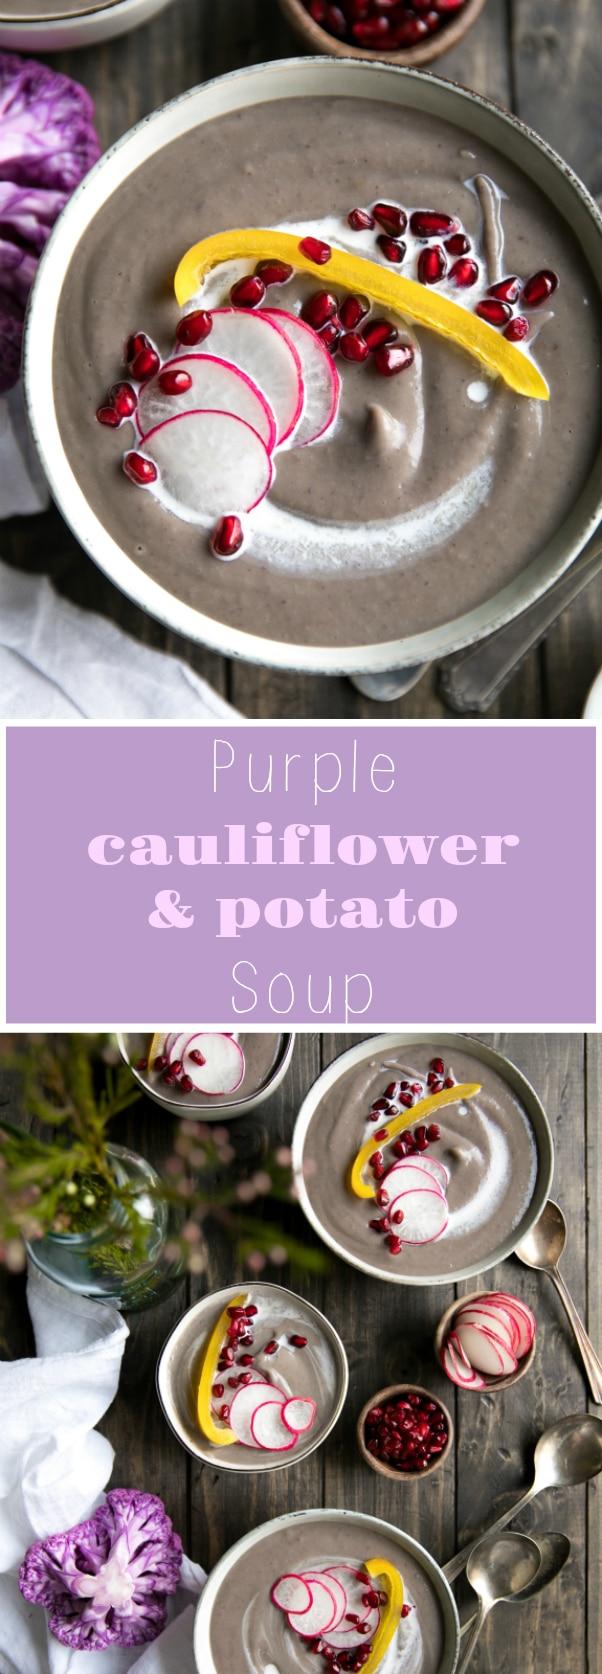 Purple Cauliflower and Potato Soup via @theforkedspoon #vegetarian #vegan #soup #cauliflower #healthy #potatoes #coconutmilk #glutenfree #winter #theforkedspoon